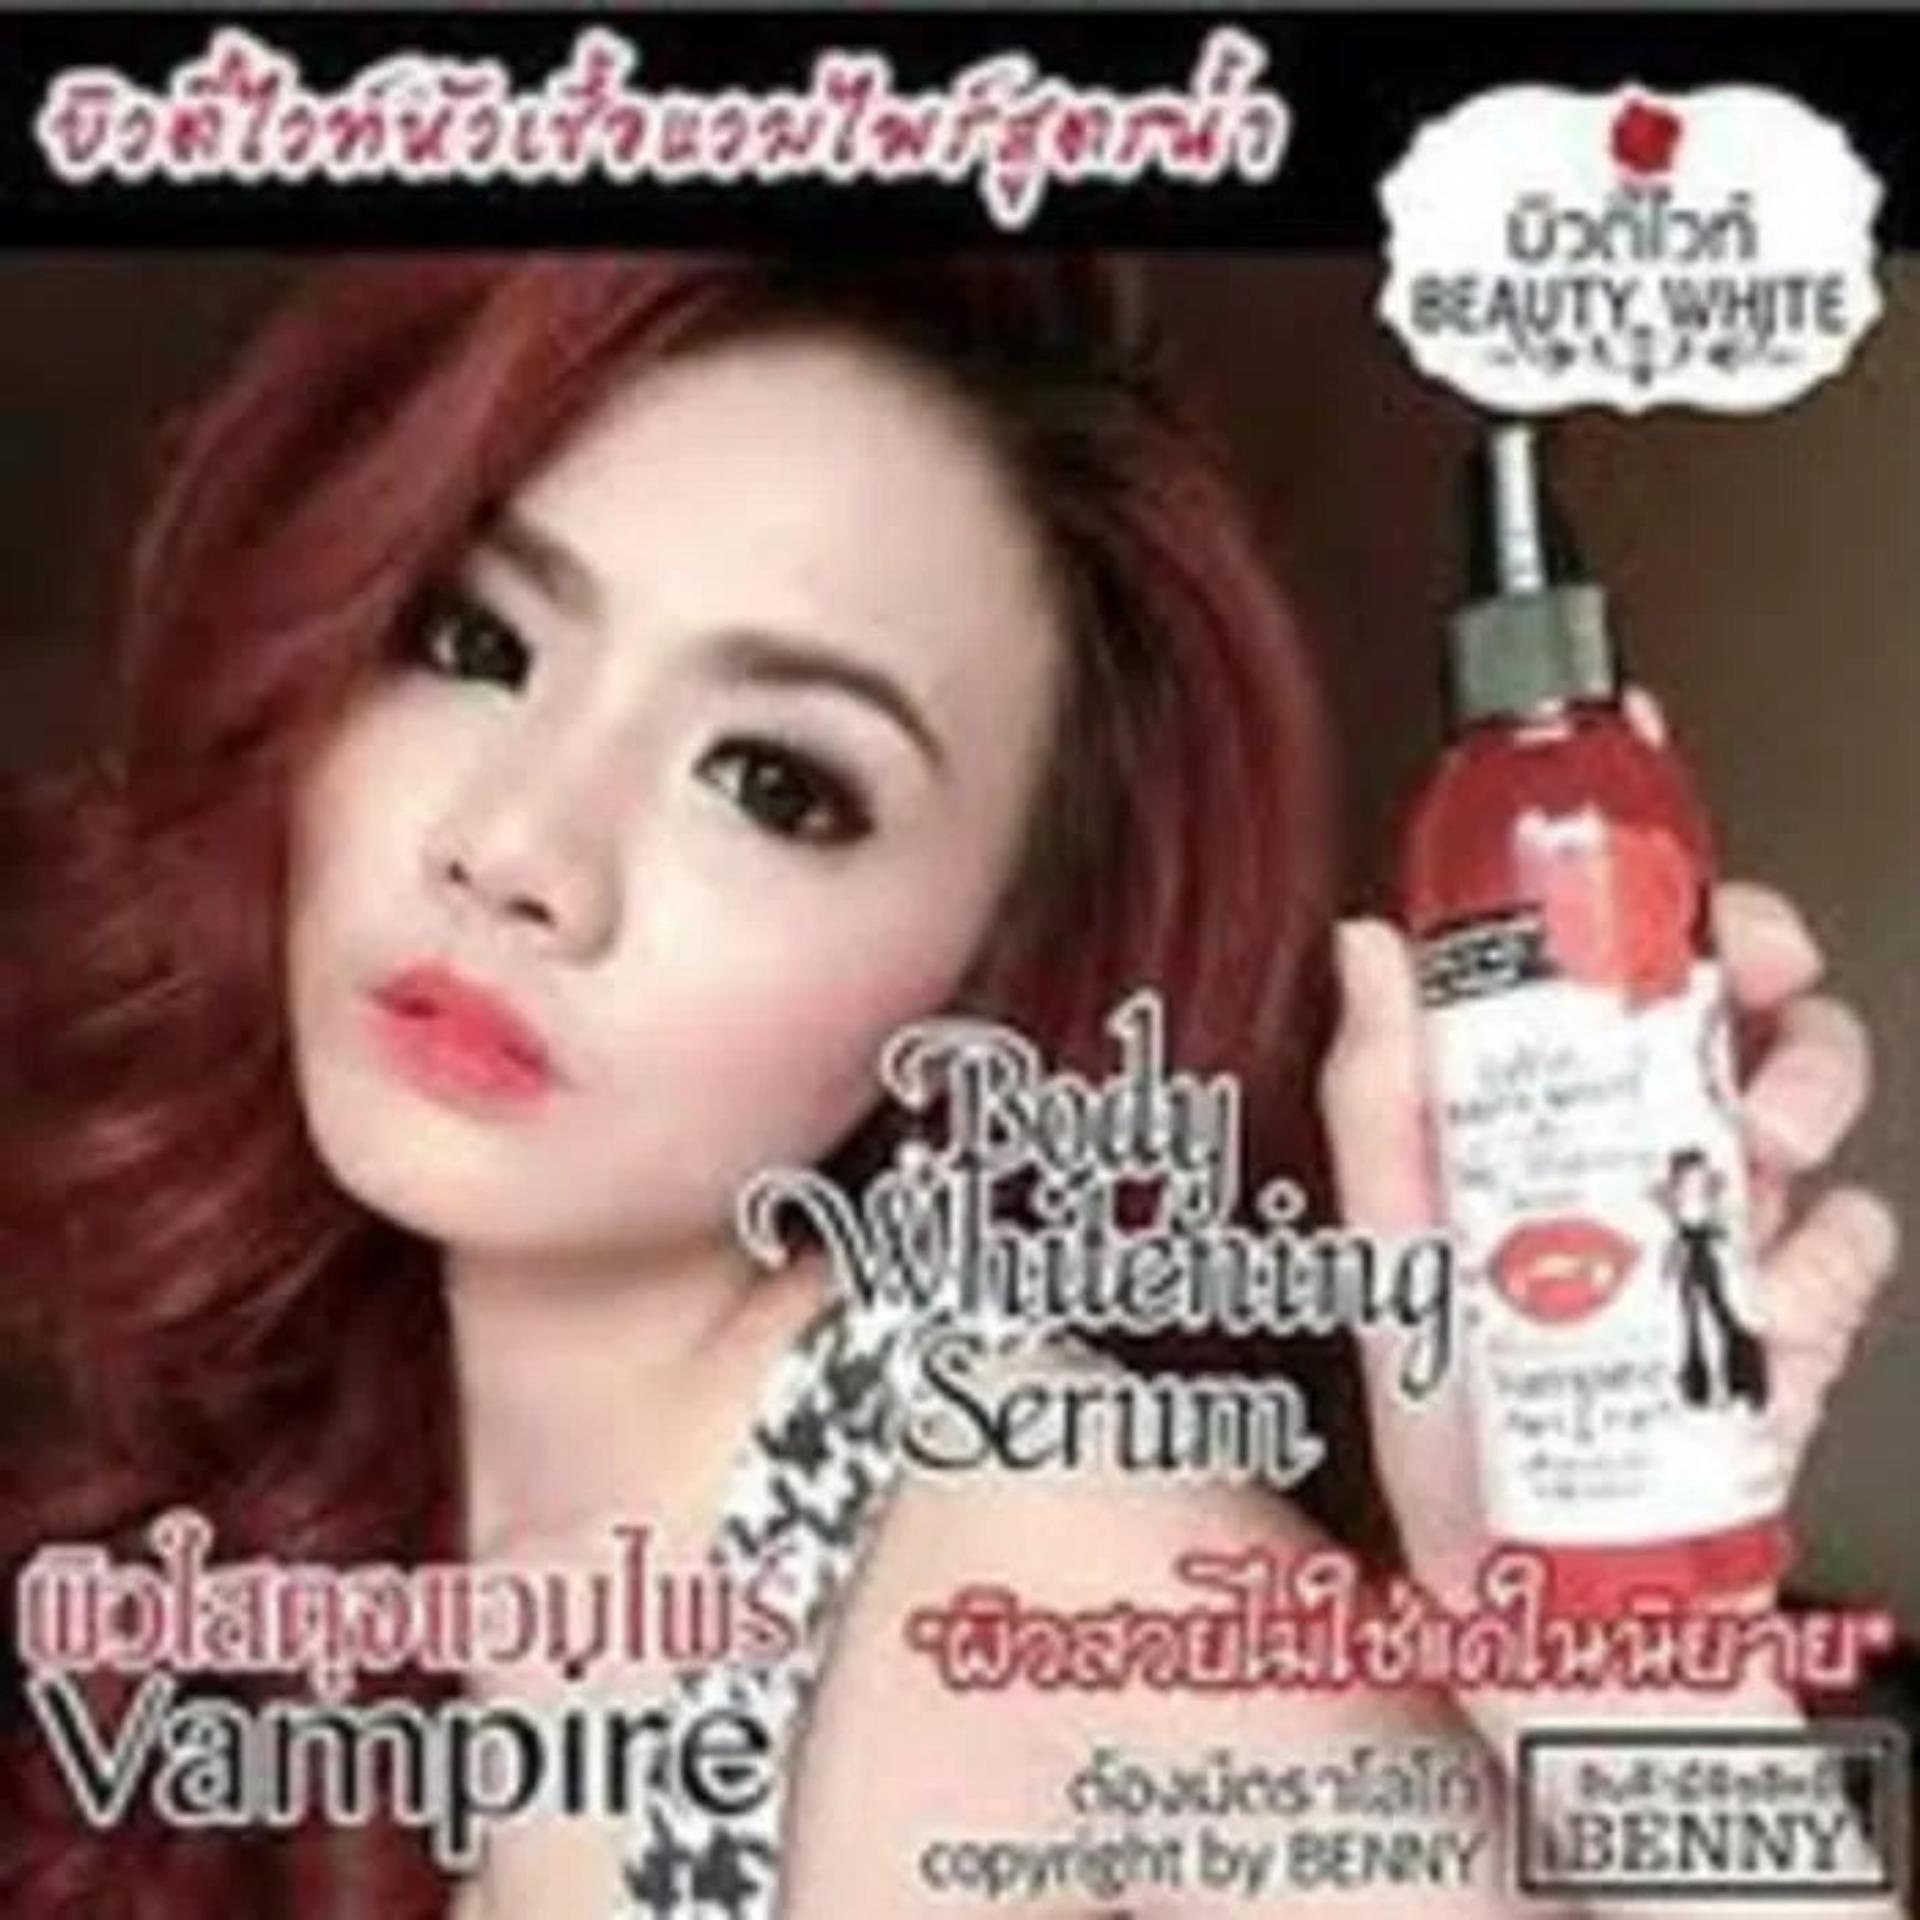 Buy Sell Cheapest Vampire Serum 120ml Best Quality Product Deals Original Thailand Big Benny Infection Whitening 100 Dari Thai